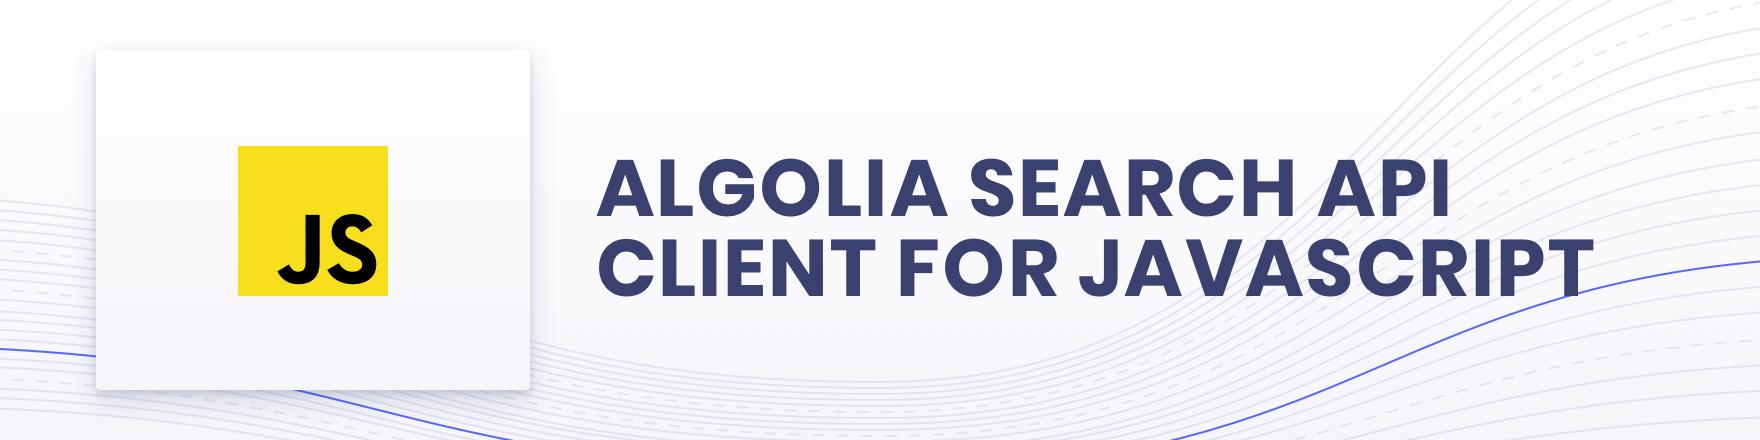 Algolia for JavaScript